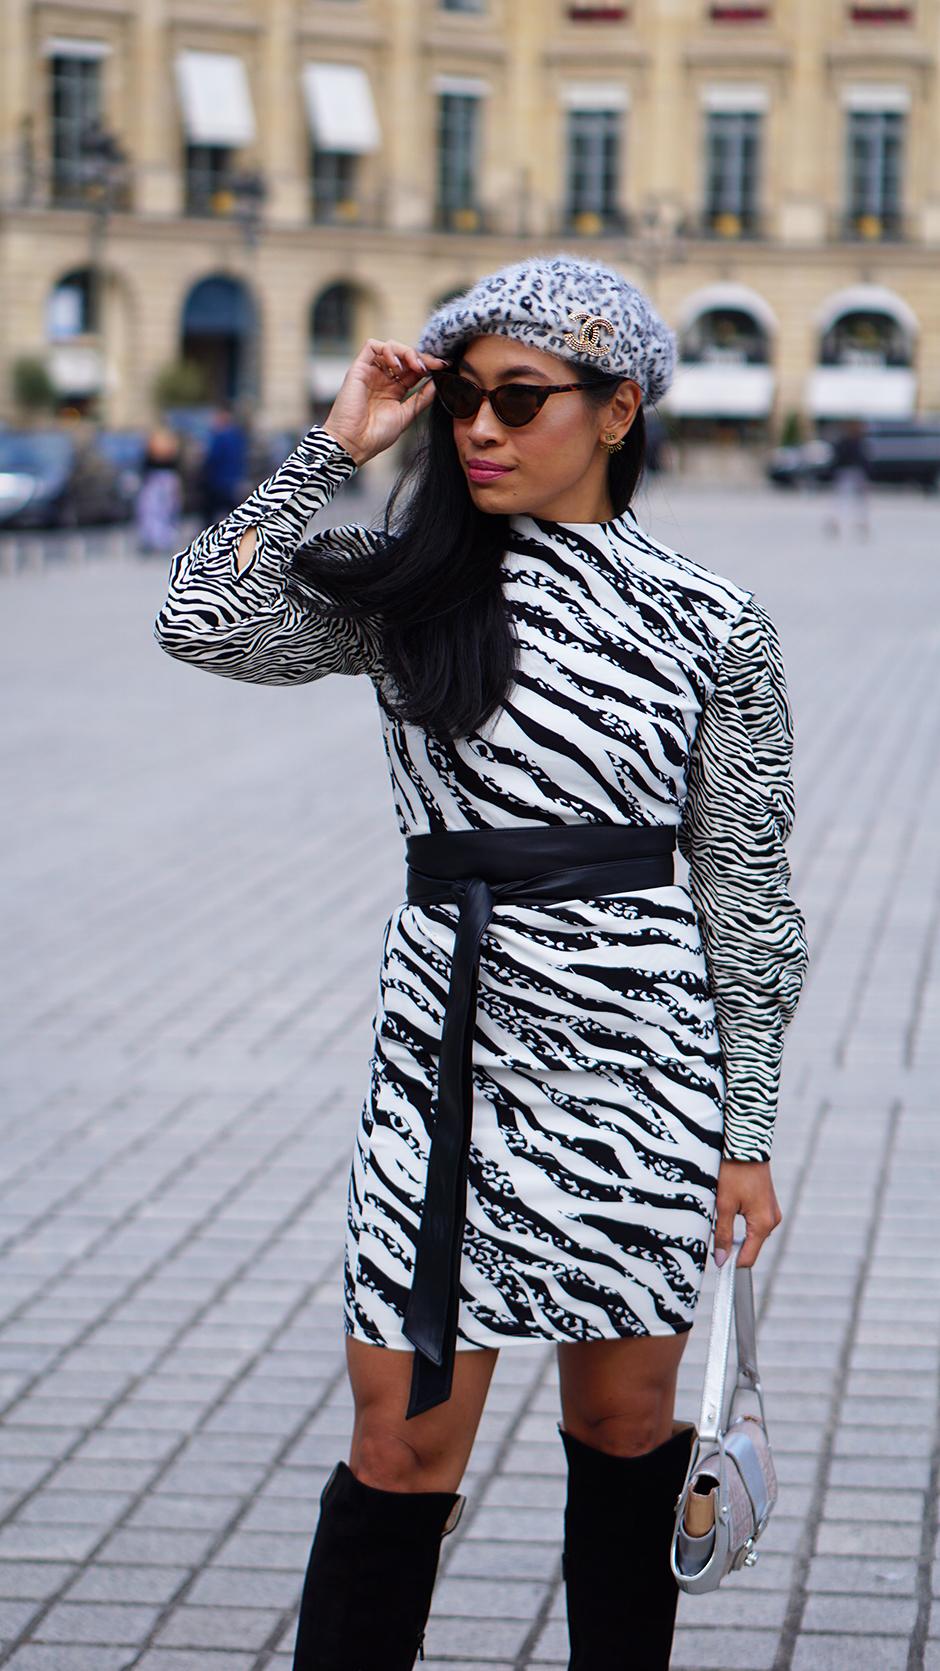 Paris Fashion Week Street Style Fall 2018 #Street #Fashion #Blog #Blogger #pfw #pfw2018 #ss18 #fw18 #parisfashionweek dior #diorbag #diorsaddle #metallo #metallicdress #silverdress #statementheels #Paris #France #fashionblog #styleblog #streetstyle #bestoutfit #falloutfit #beststyle #stylishoutfit #fallfashion #fallstyle #outfitinspo #outfitinspiration #outfitideas #leoparddress #versace #gianniversace #vintageversace #leopard #animalprint #fallfashion #kneeboots #beret #manoloblahnik #vintagefendi #fendibaguette #fendi #fendibag